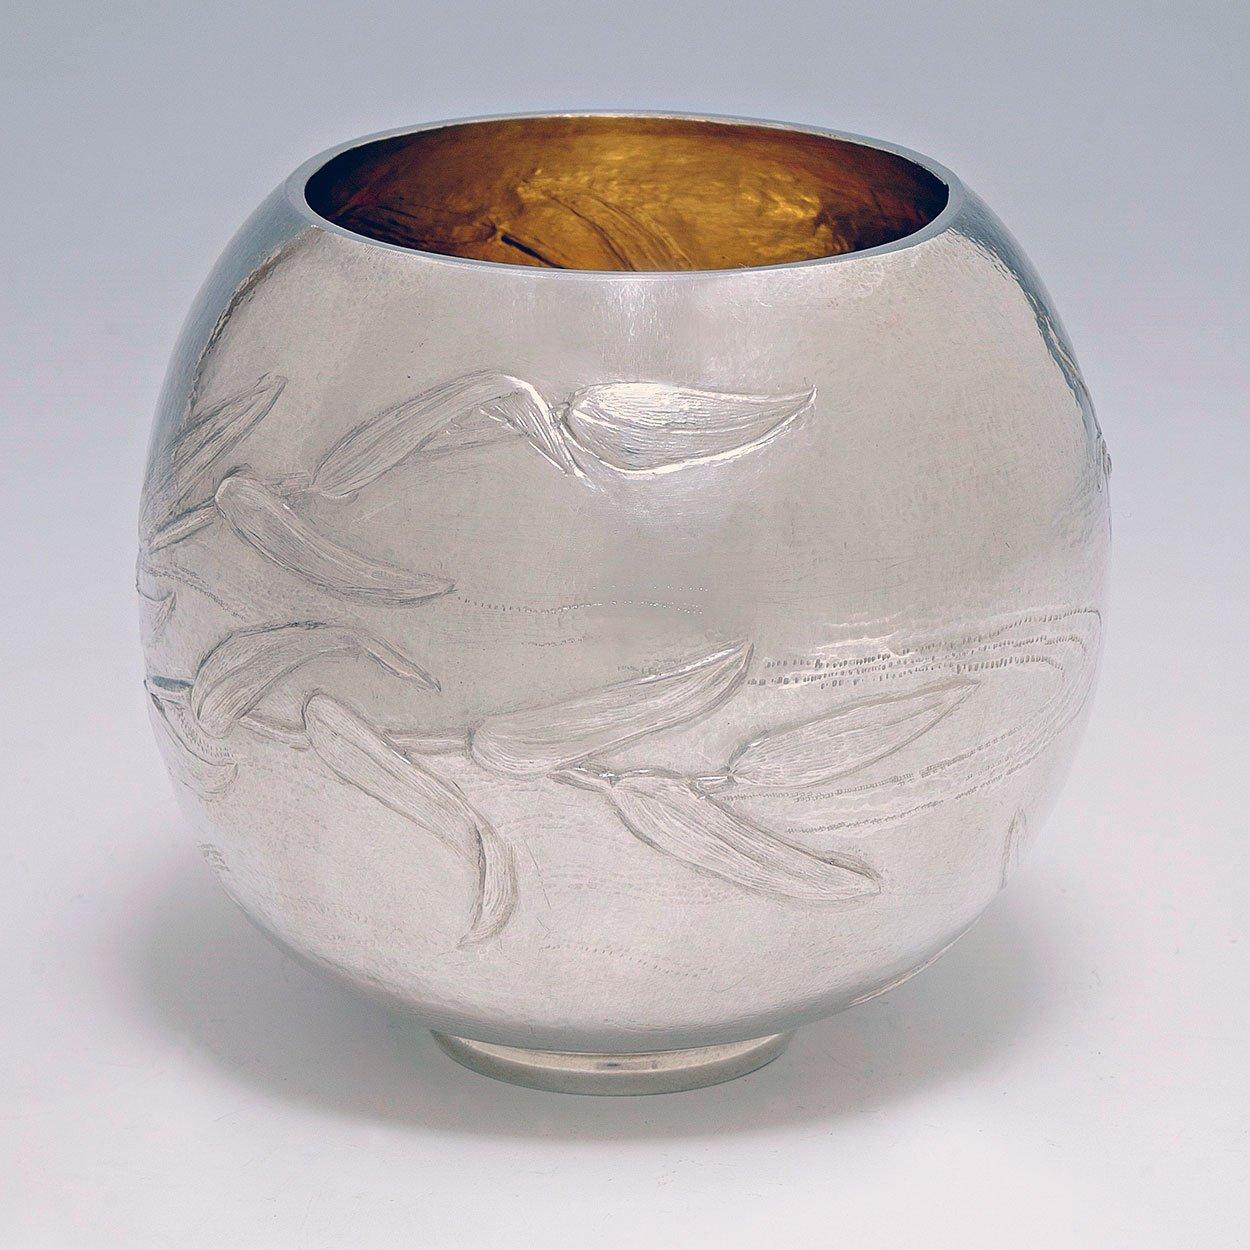 Bamboo Bowl ETHOX Award